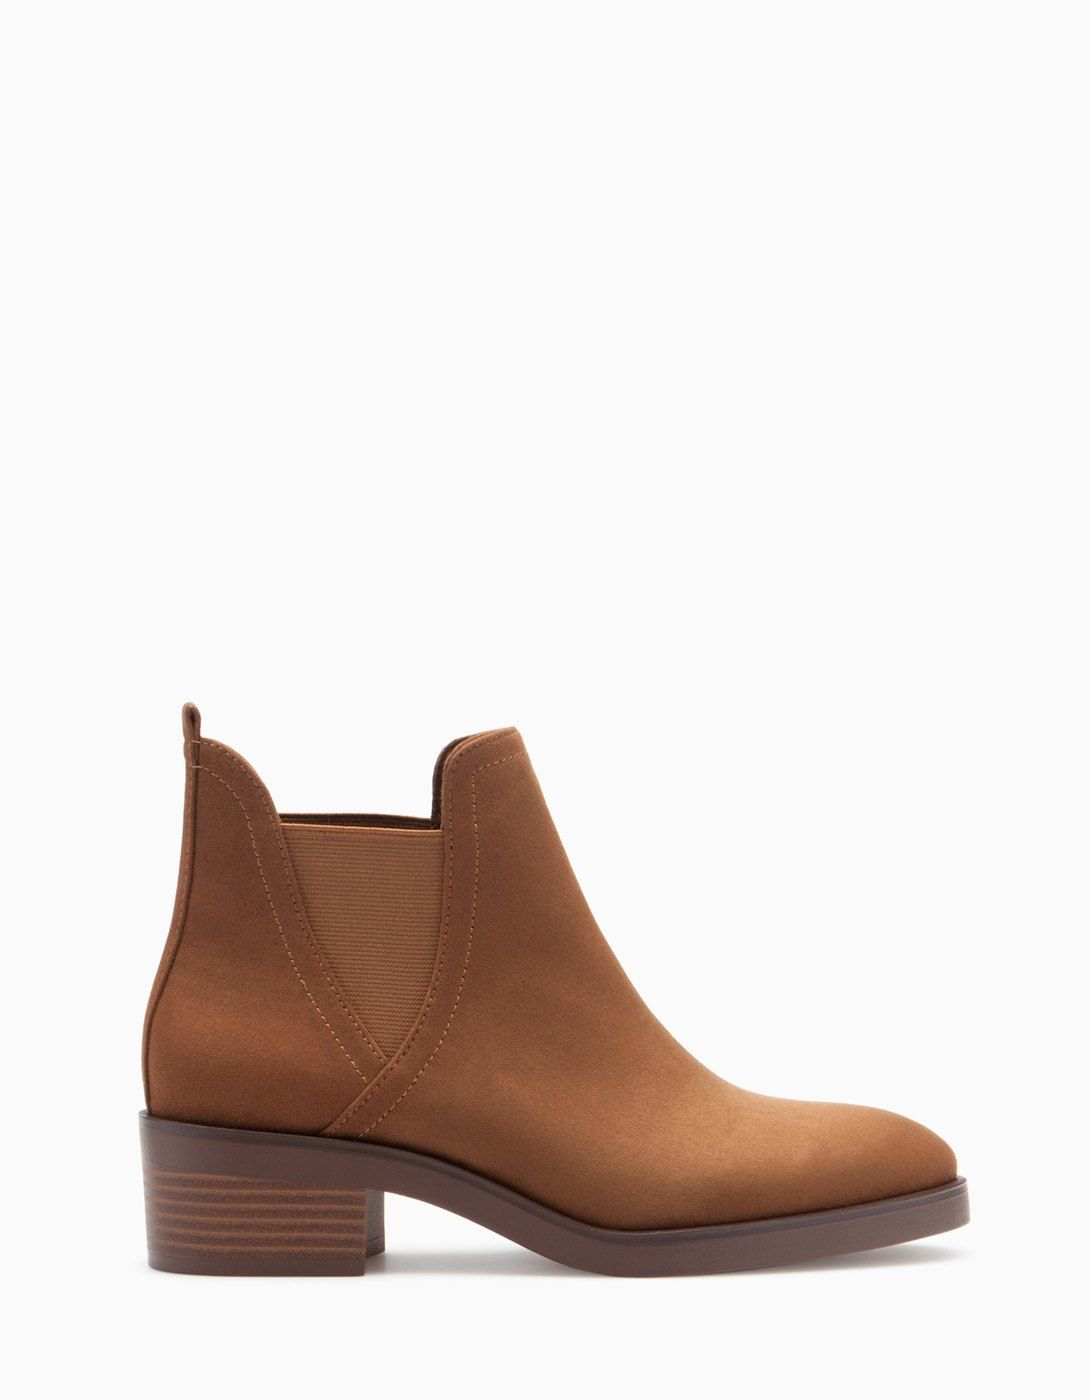 bottines élastiquées - bottes et bottines - femme | stradivarius